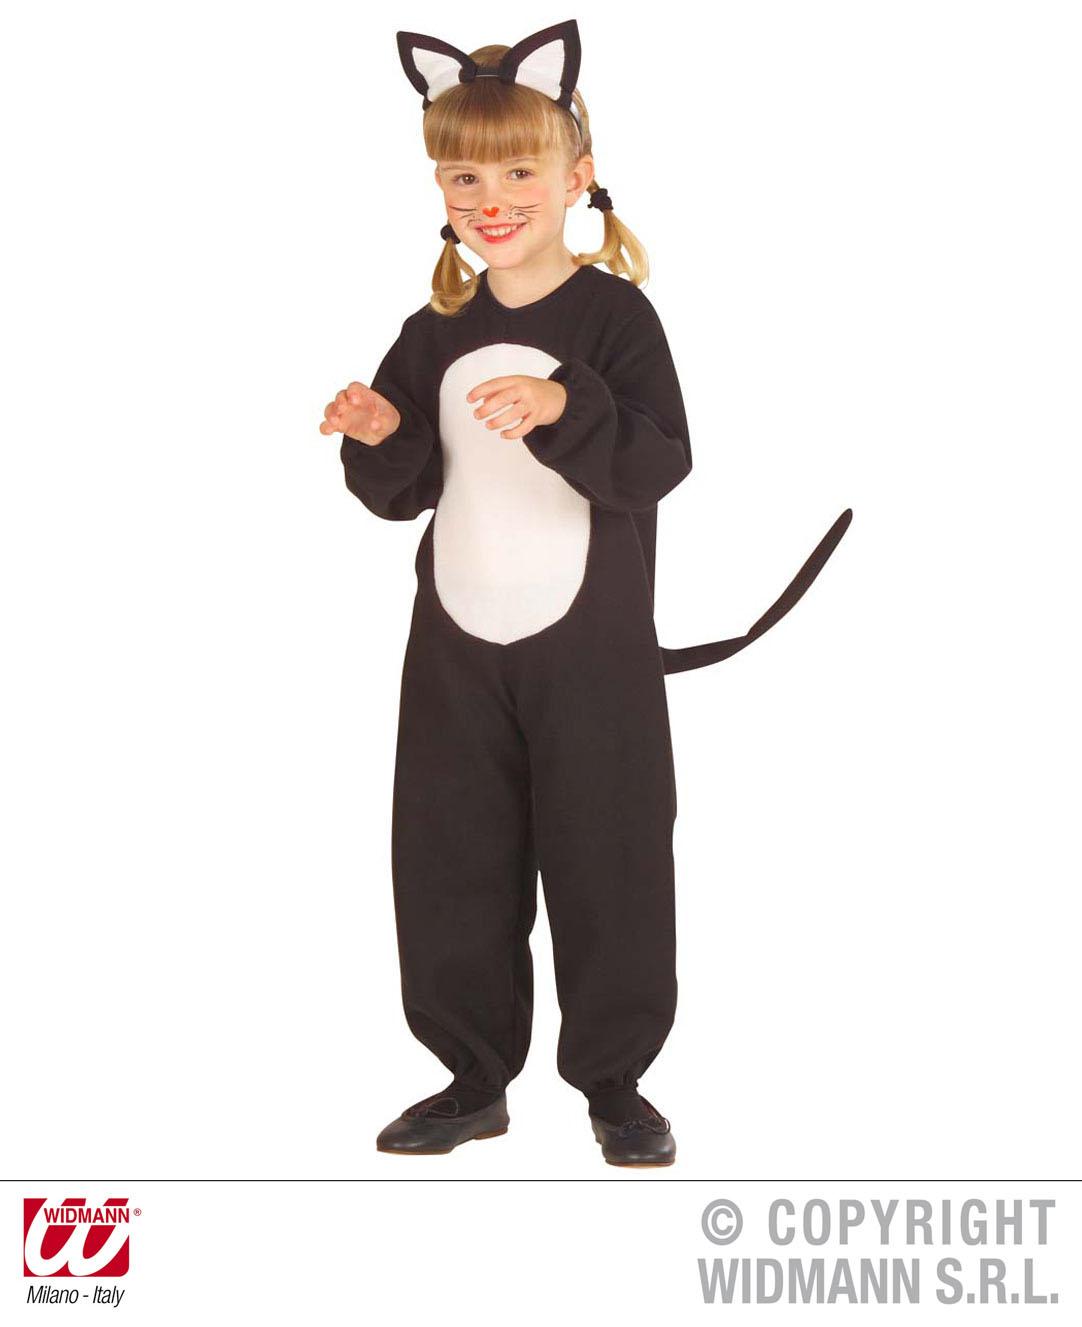 kinder schwarze katze kost m verkleidung halloween hexe katze outfit 3 4 jahre ebay. Black Bedroom Furniture Sets. Home Design Ideas